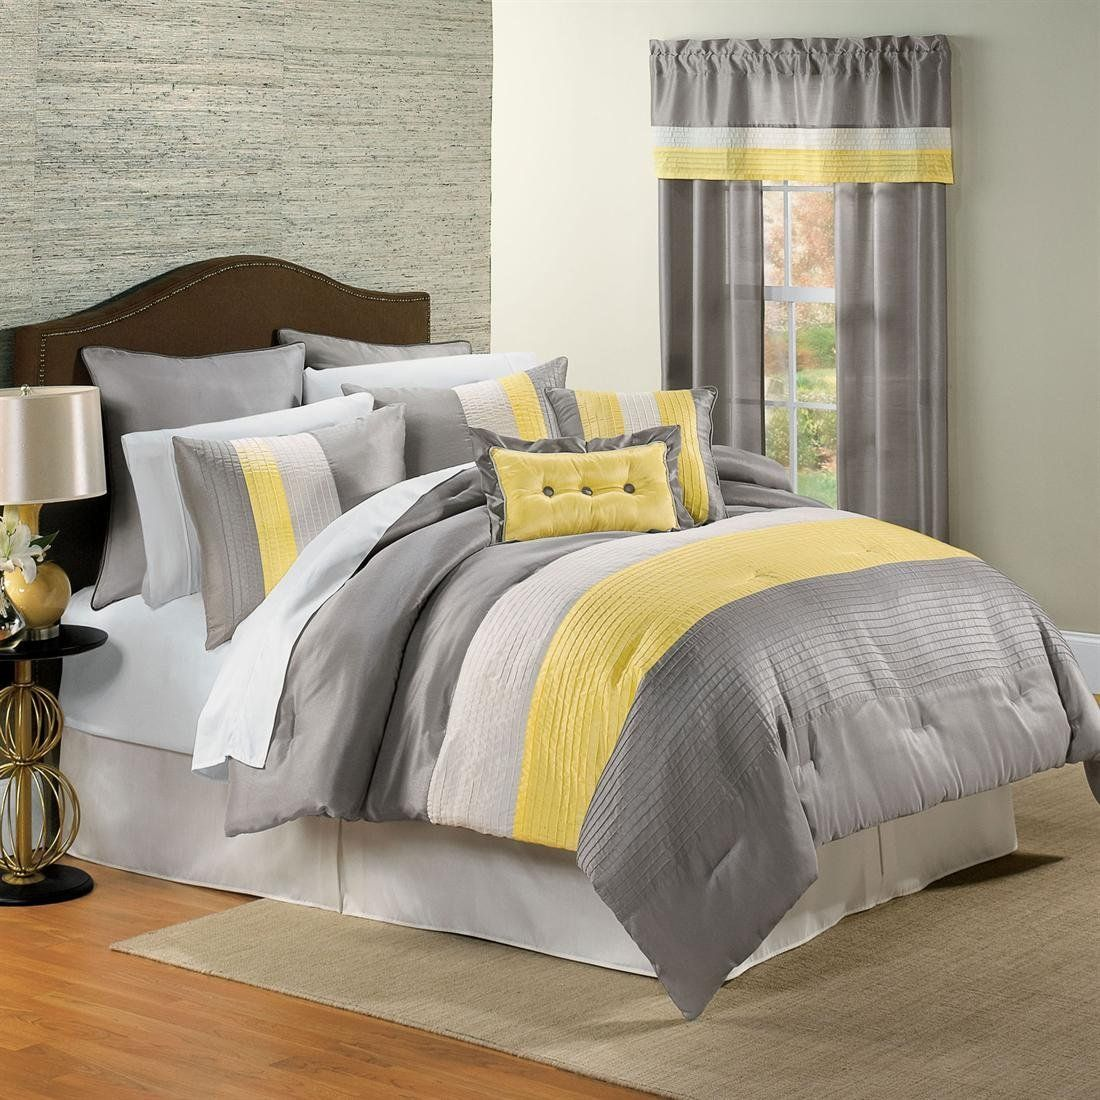 Lime Green And Gray Bedding Grey Bedroom Design Grey Bedroom